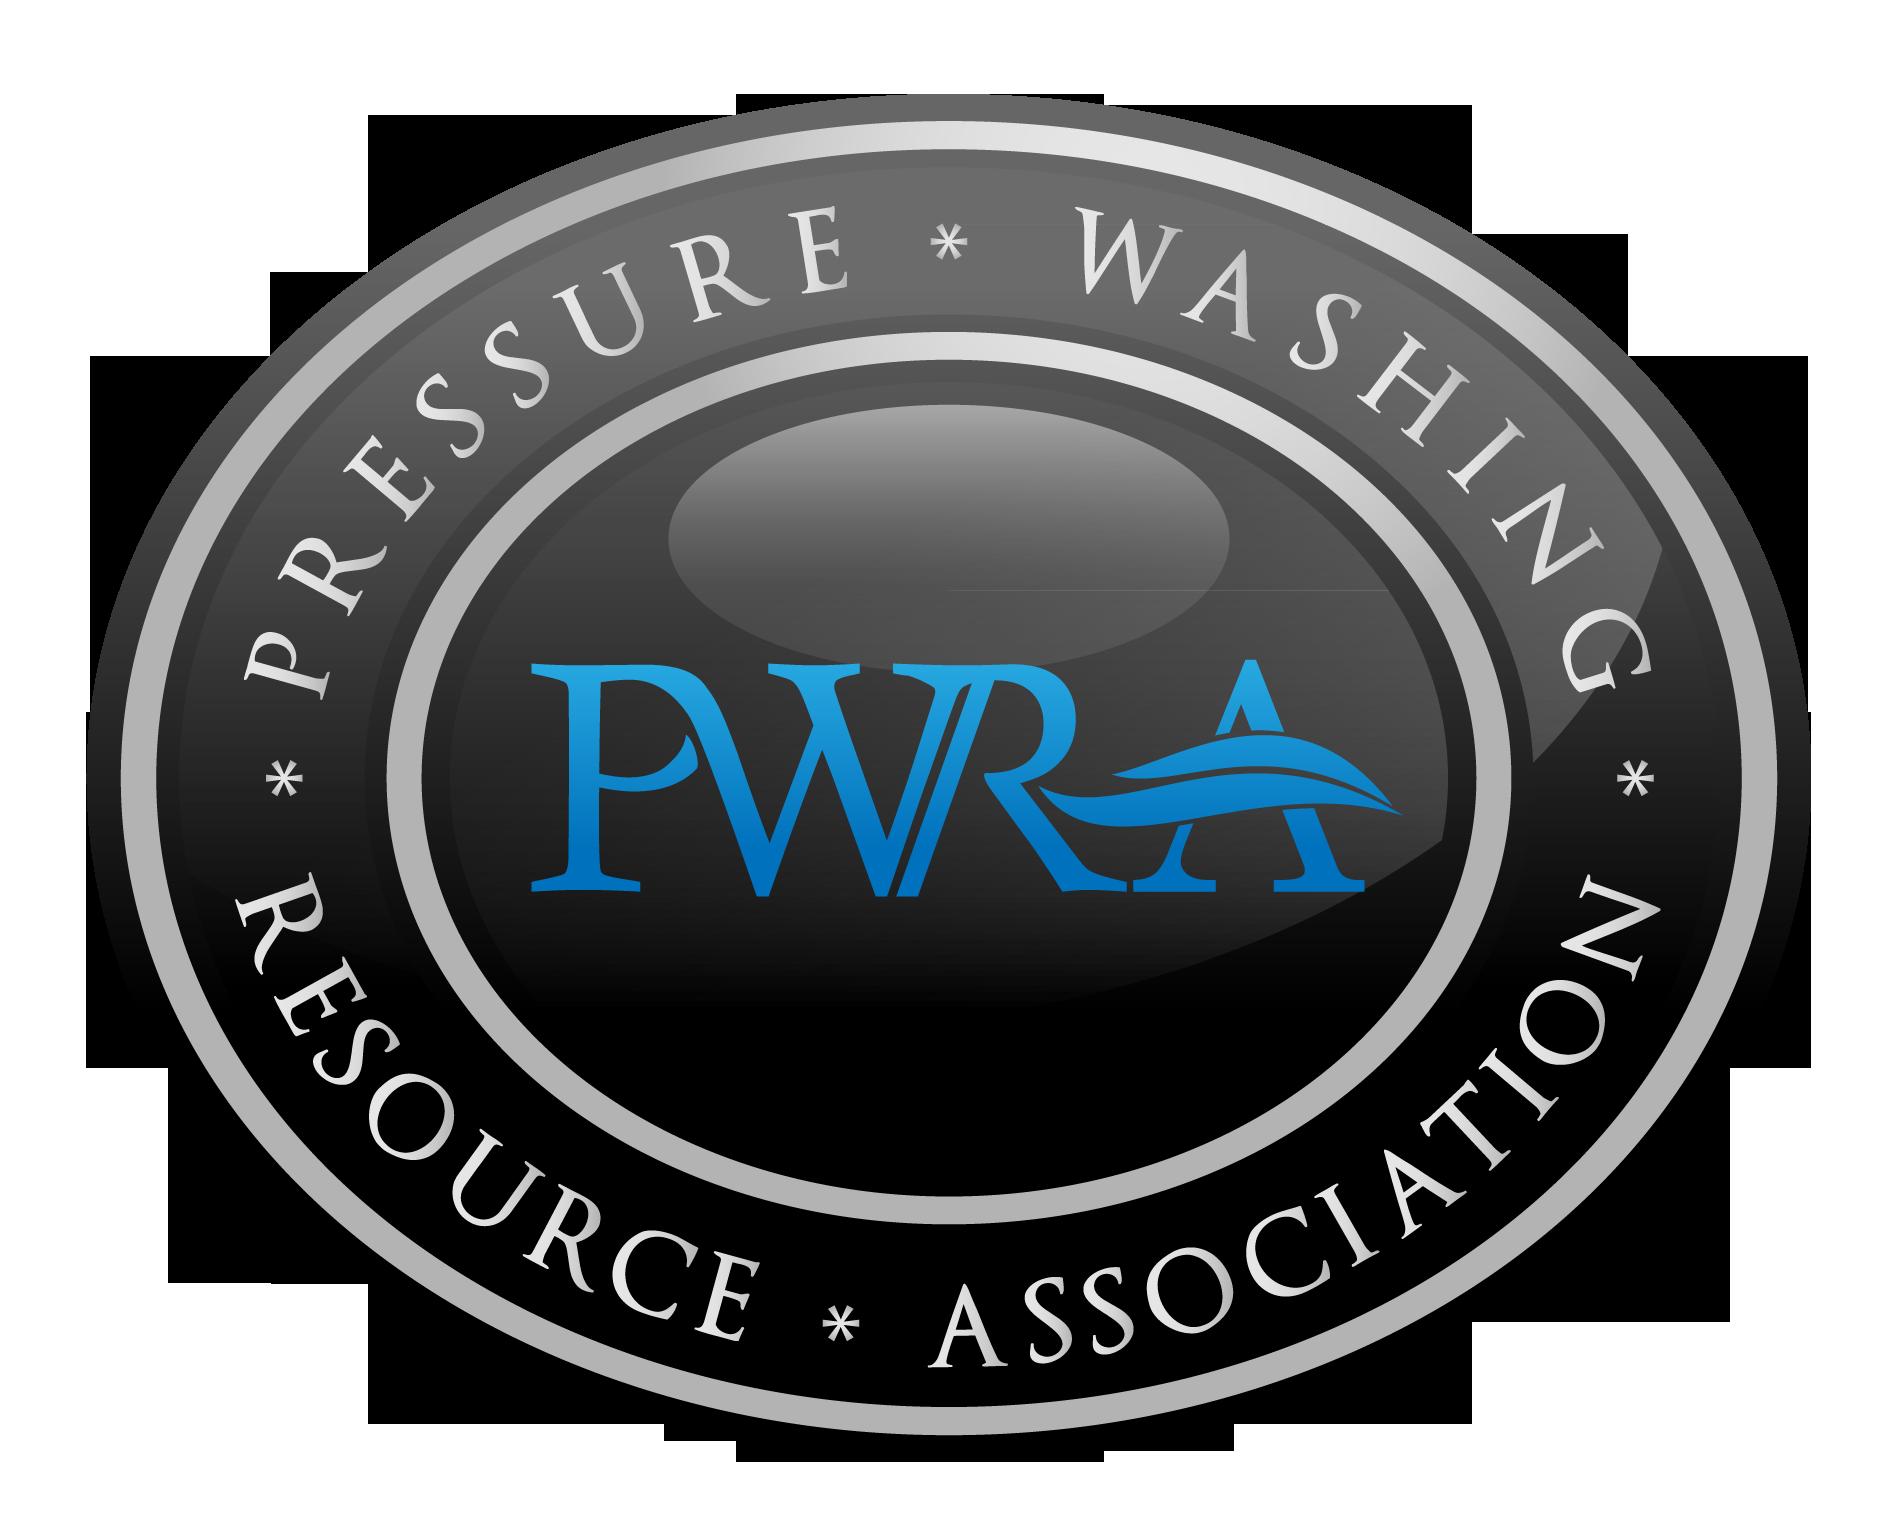 Caretaker Services Pressure Washing image 7